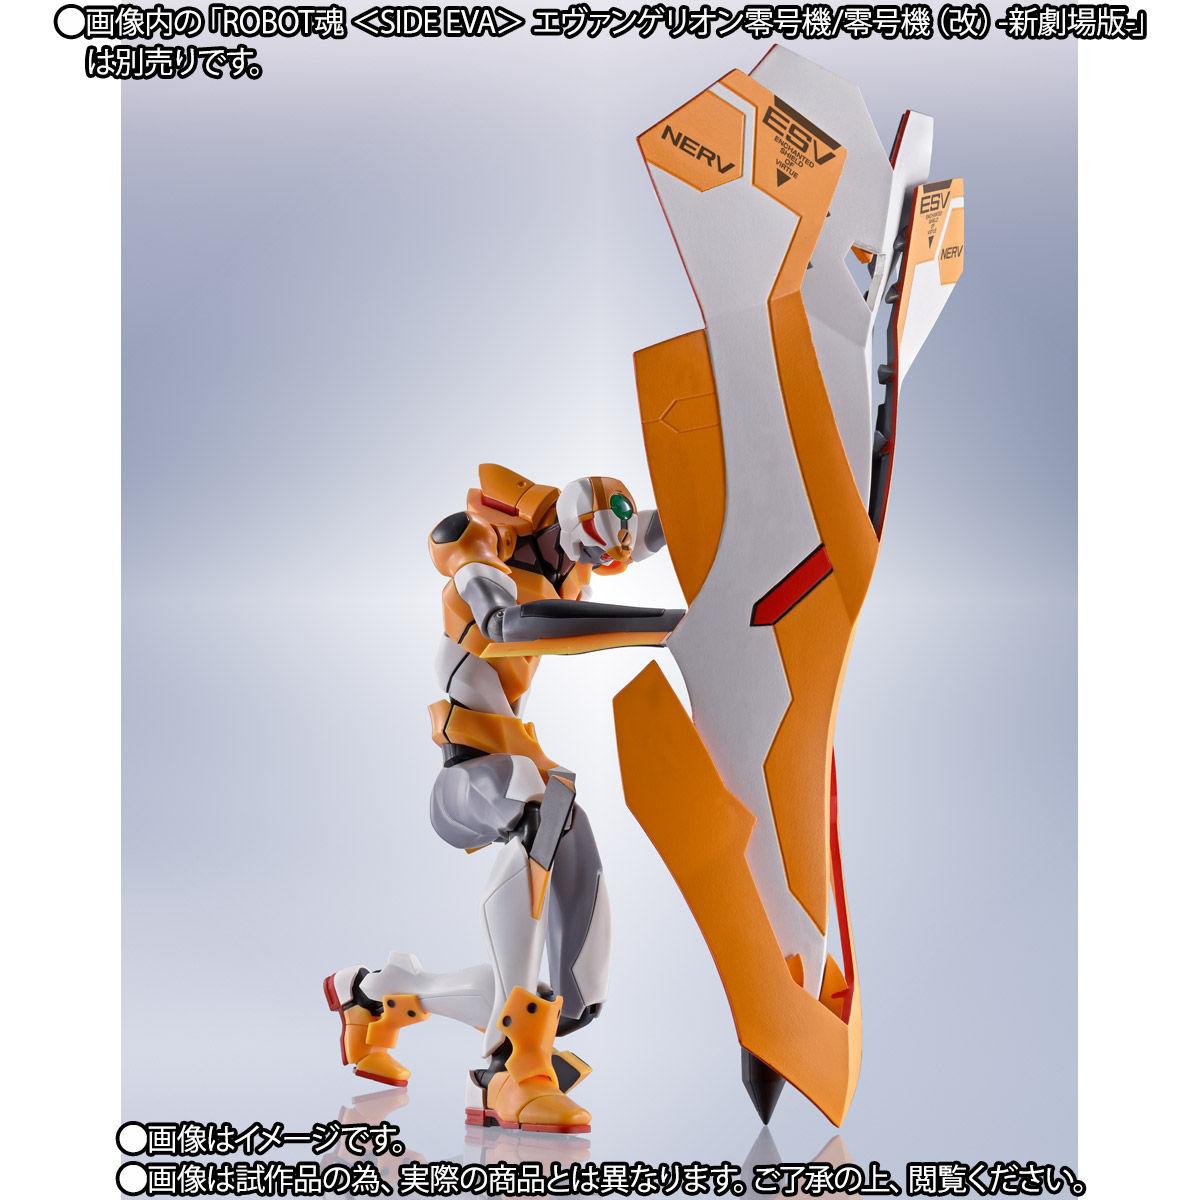 ROBOT魂〈SIDE EVA〉『ヤシマ作戦再現用ポジトロンライフル+ESVシールド+G型装備セット』ヱヴァンゲリヲン新劇場版 可動フィギュア-004